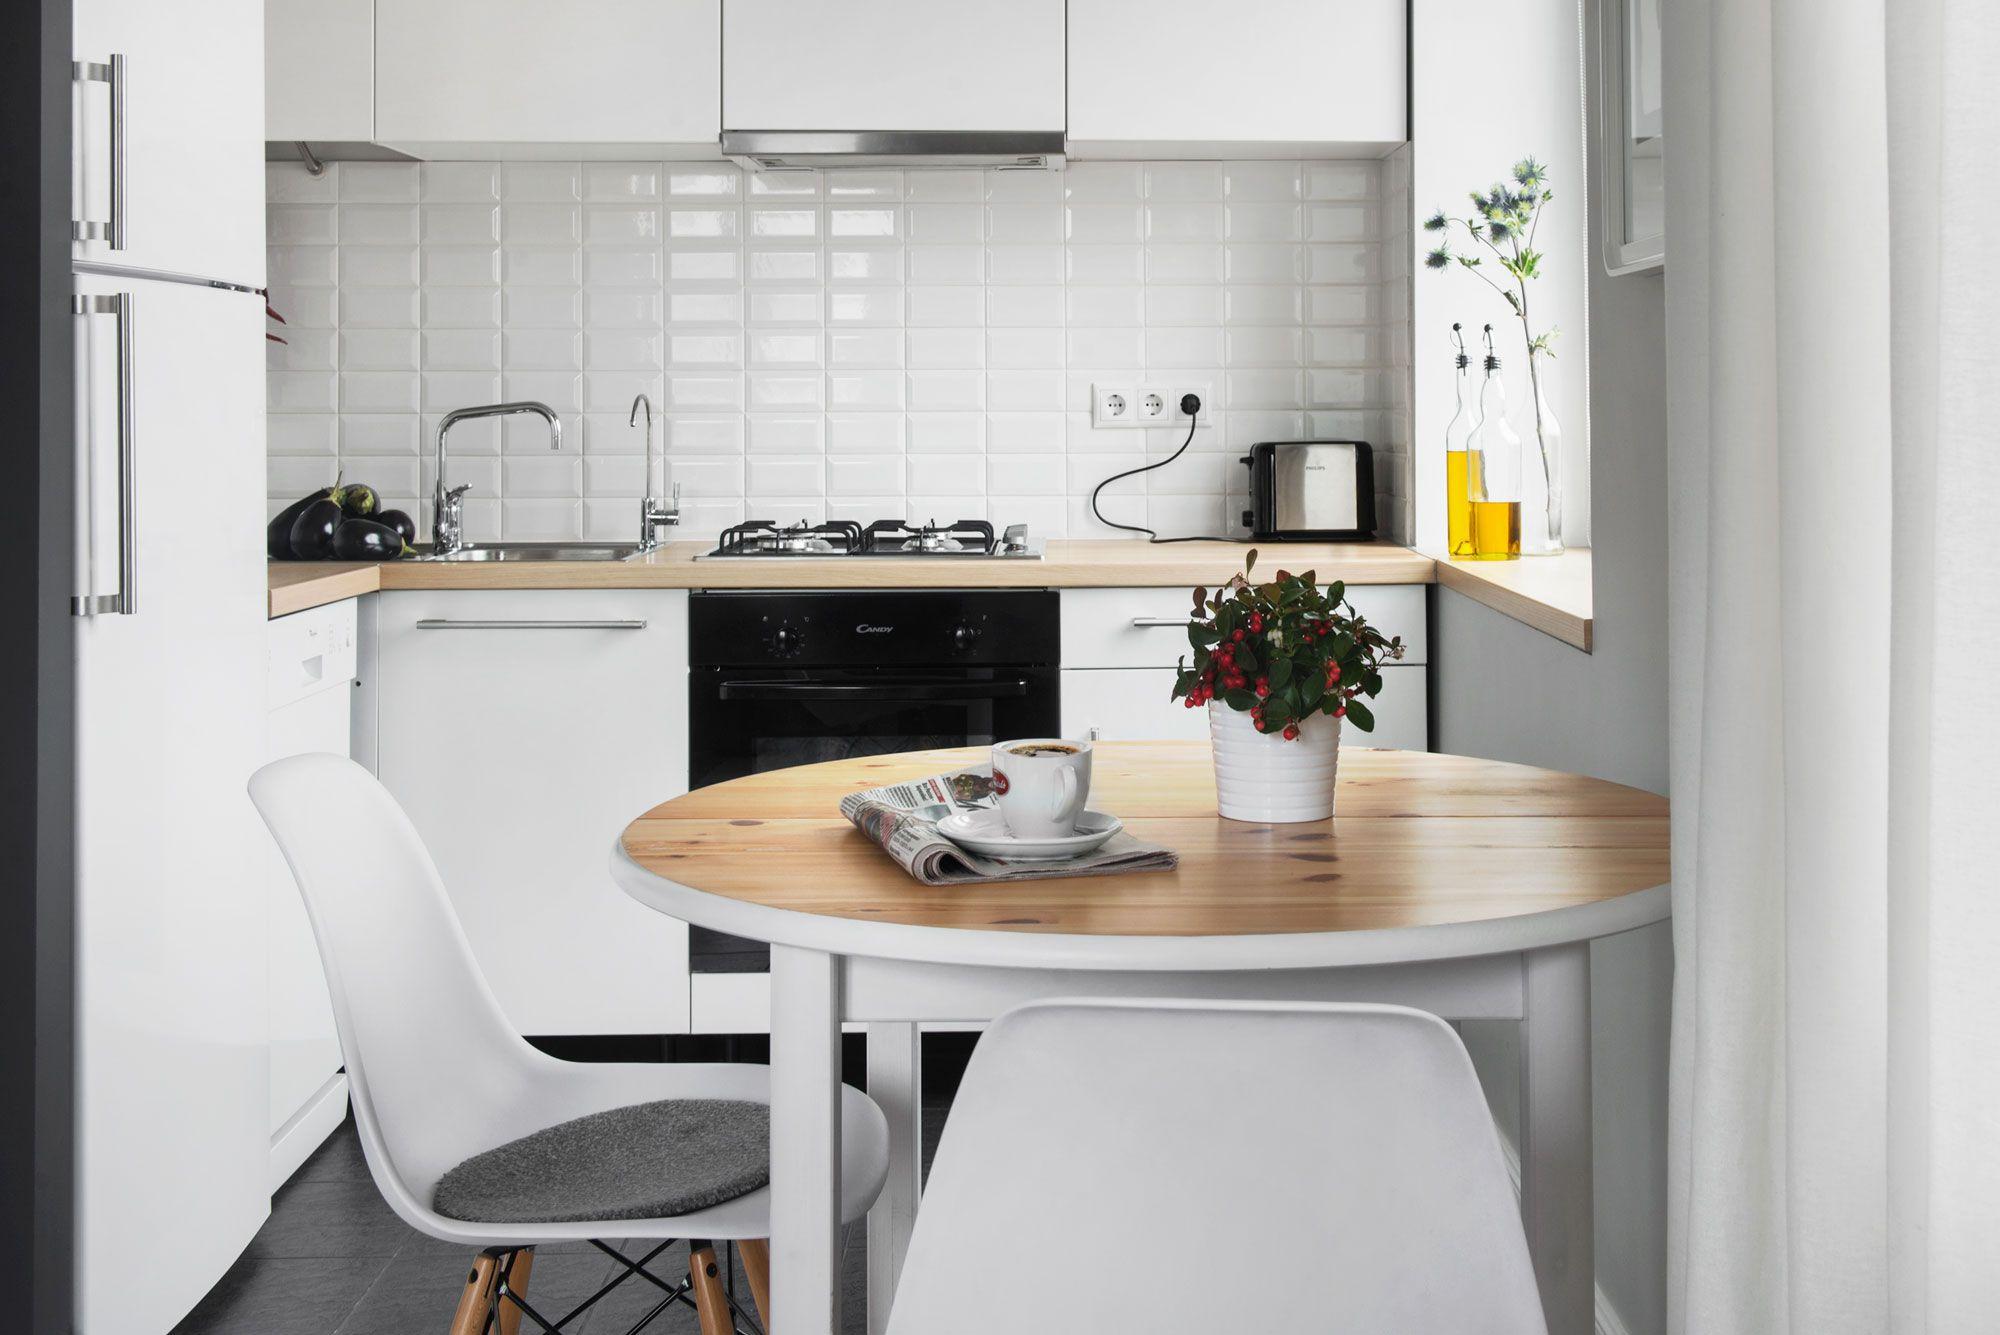 Дизайн кухни 5 м в хрущевке